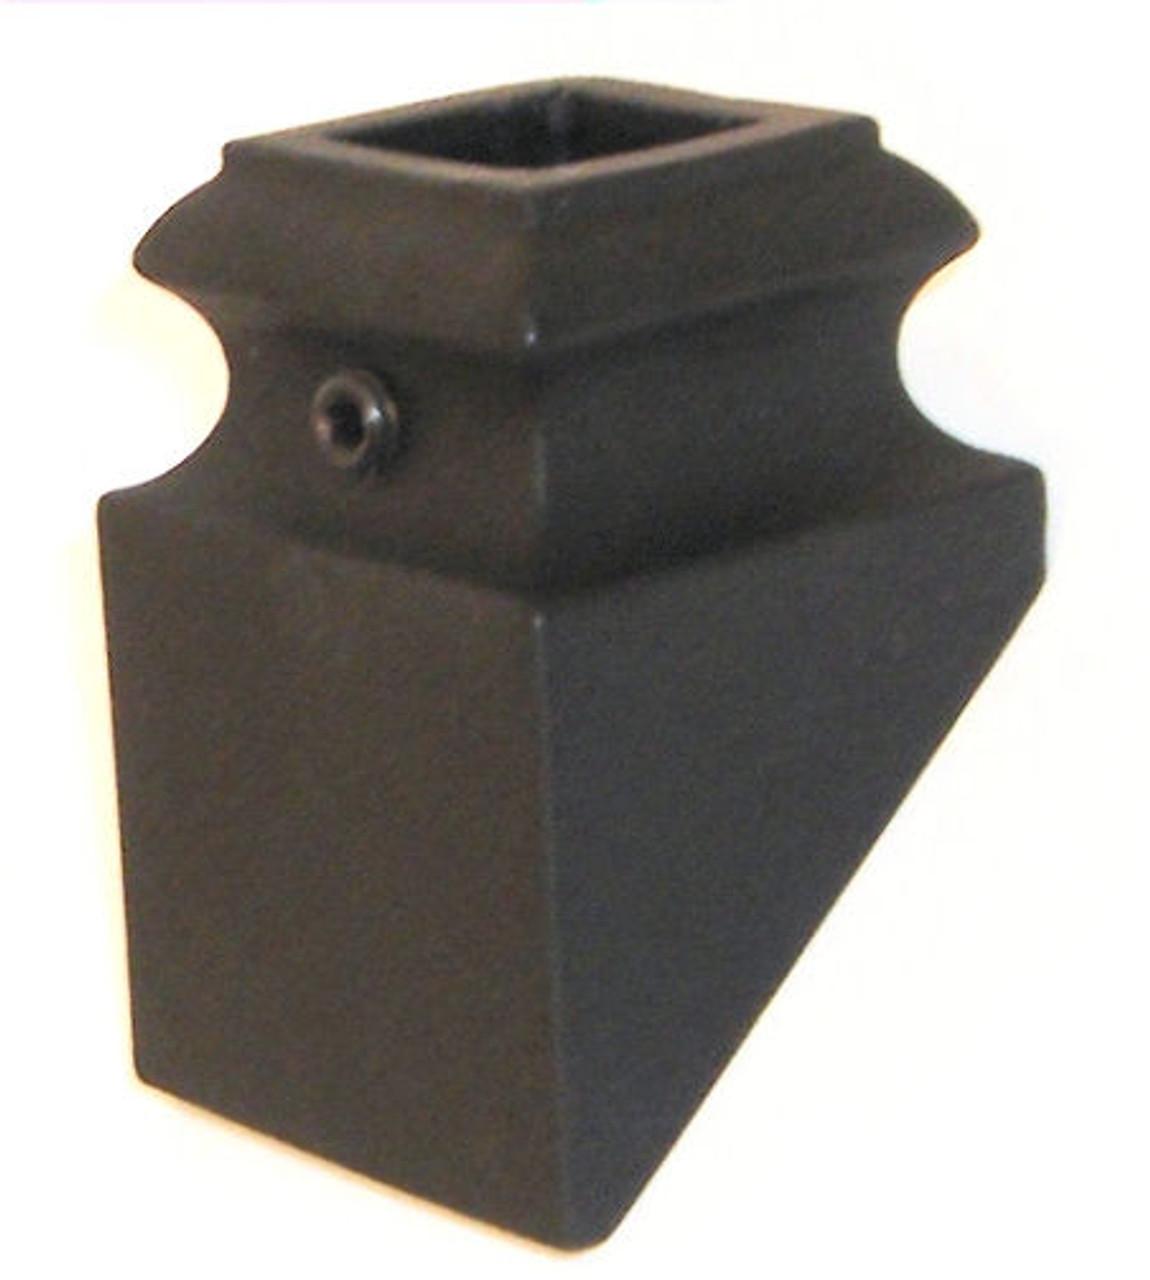 SH905 12mm Slanted Shoe for Hammered Balusters